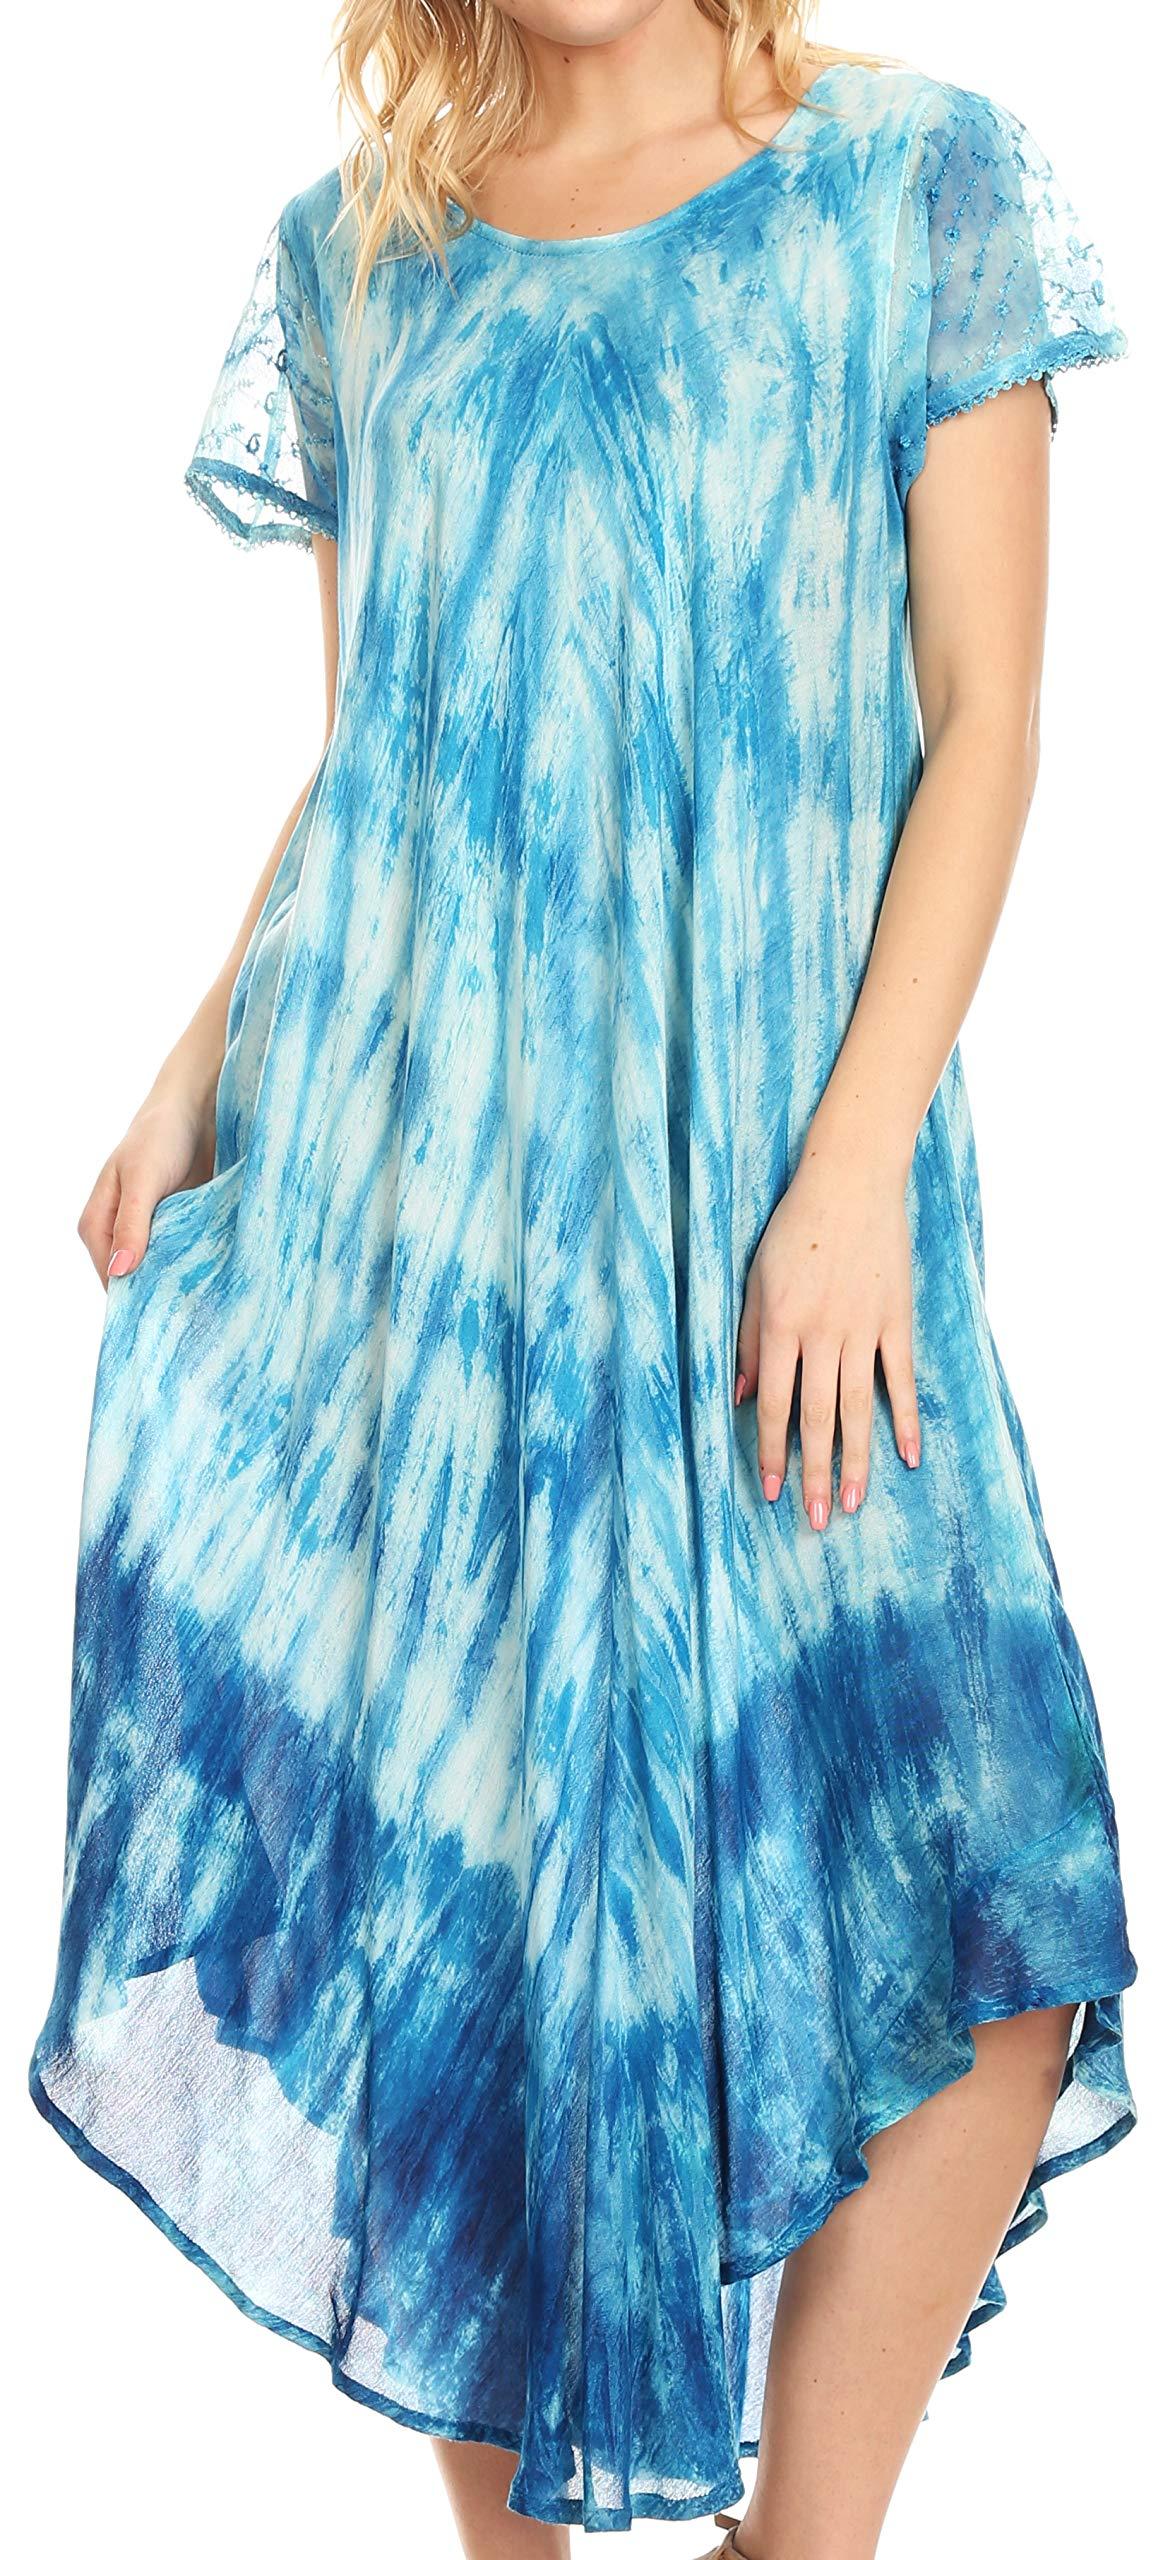 Available at Amazon: Sakkas Jonna Women's Short Sleeve Maxi Tie Dye Batik Long Casual Dress